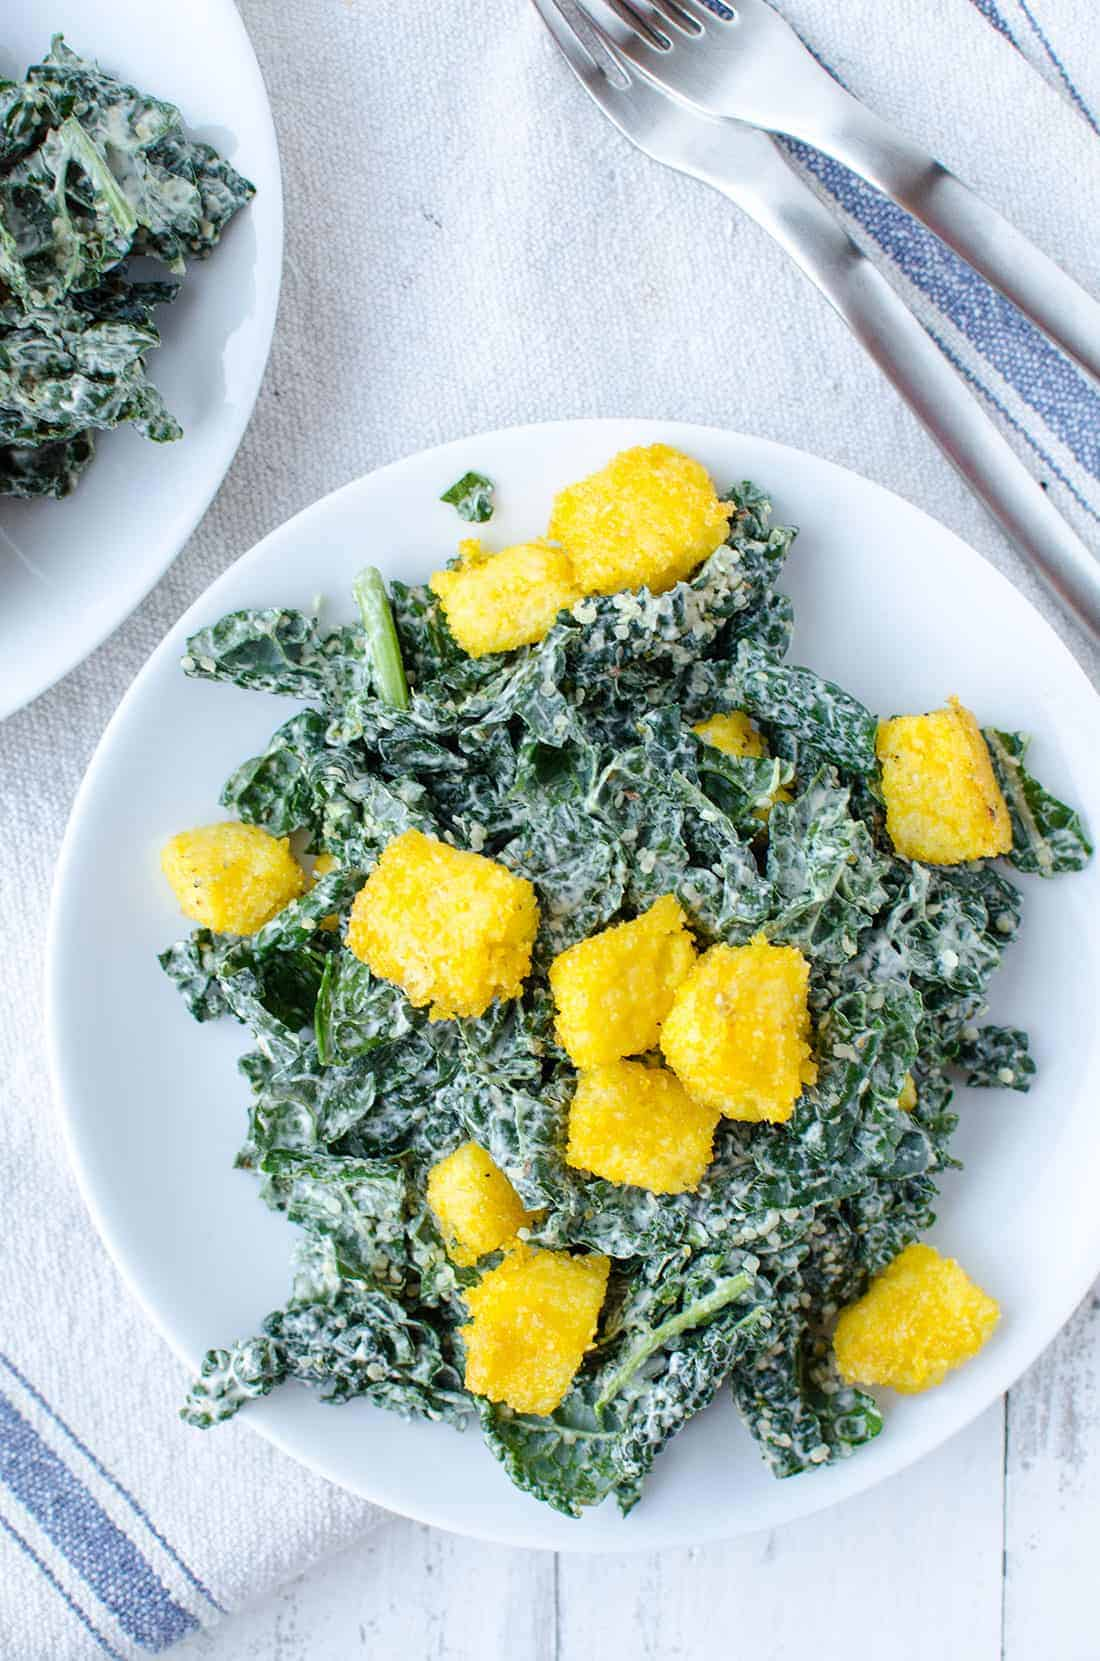 Kale Caesar Salad! Creamy caesar dressing with crispy polenta croutons. Vegan & Gluten-Free | www.delishknowledge.com